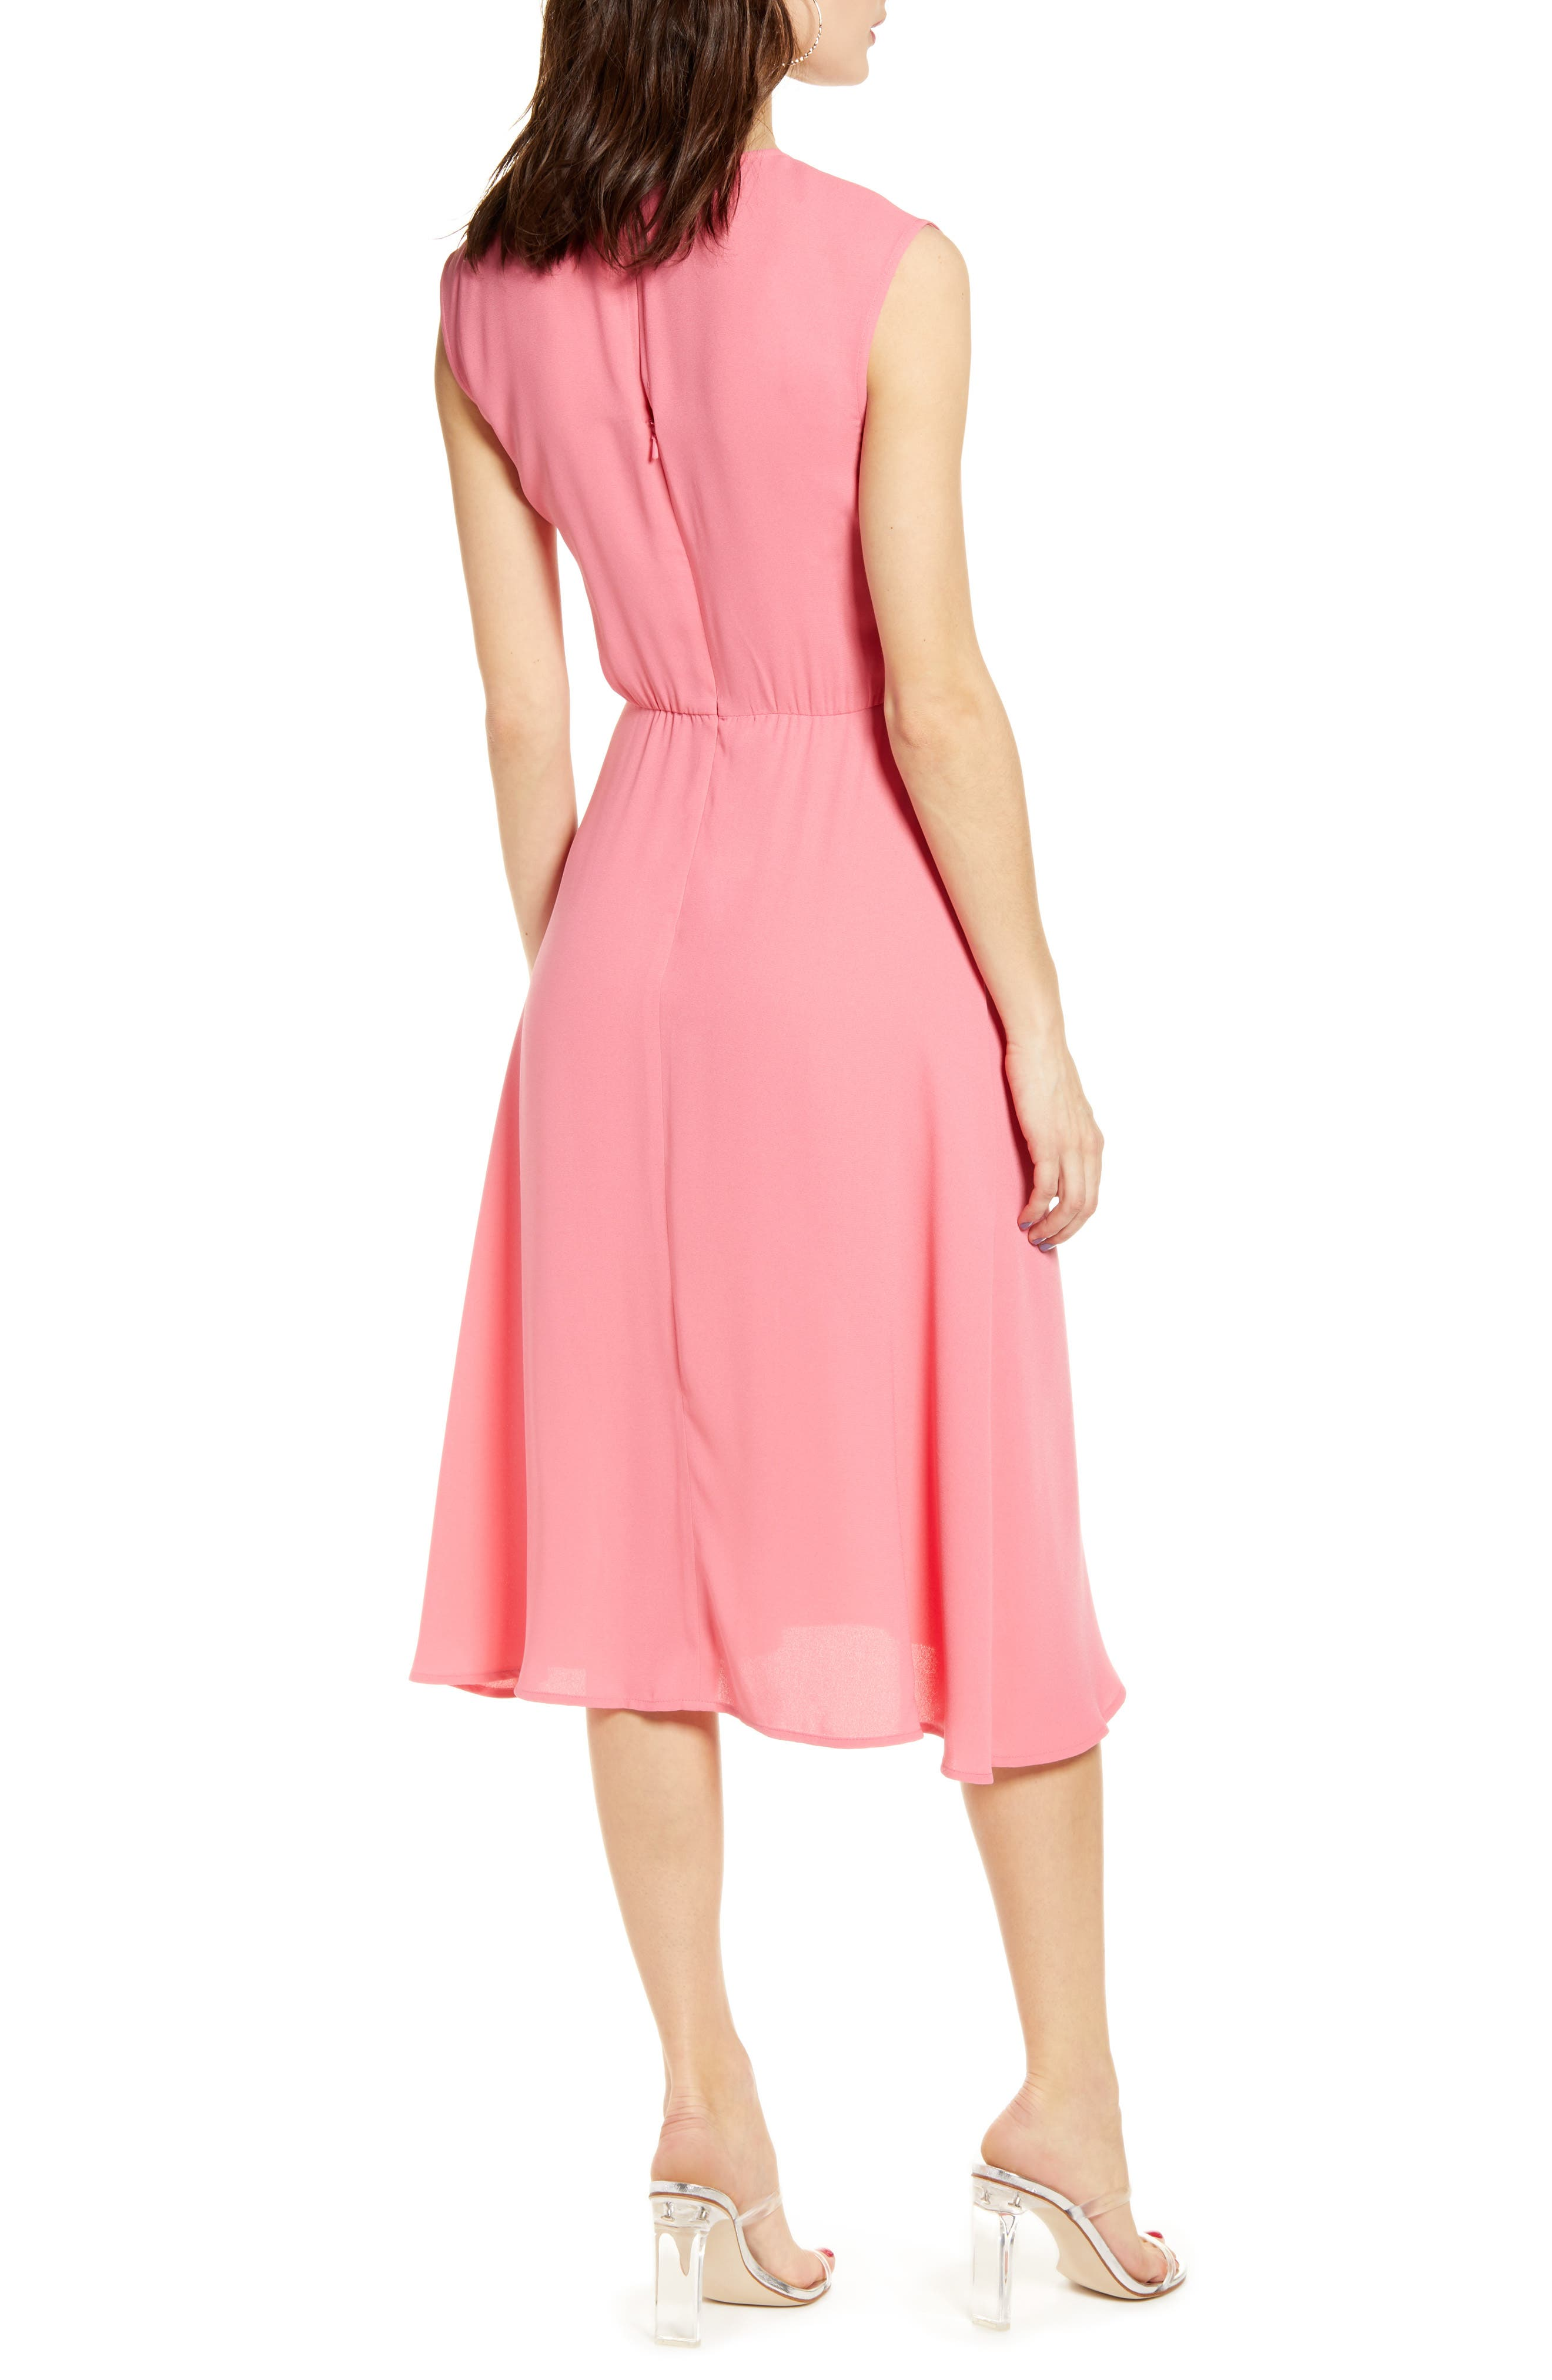 LEITH, Chic Midi Dress, Alternate thumbnail 2, color, PINK LEMONADE